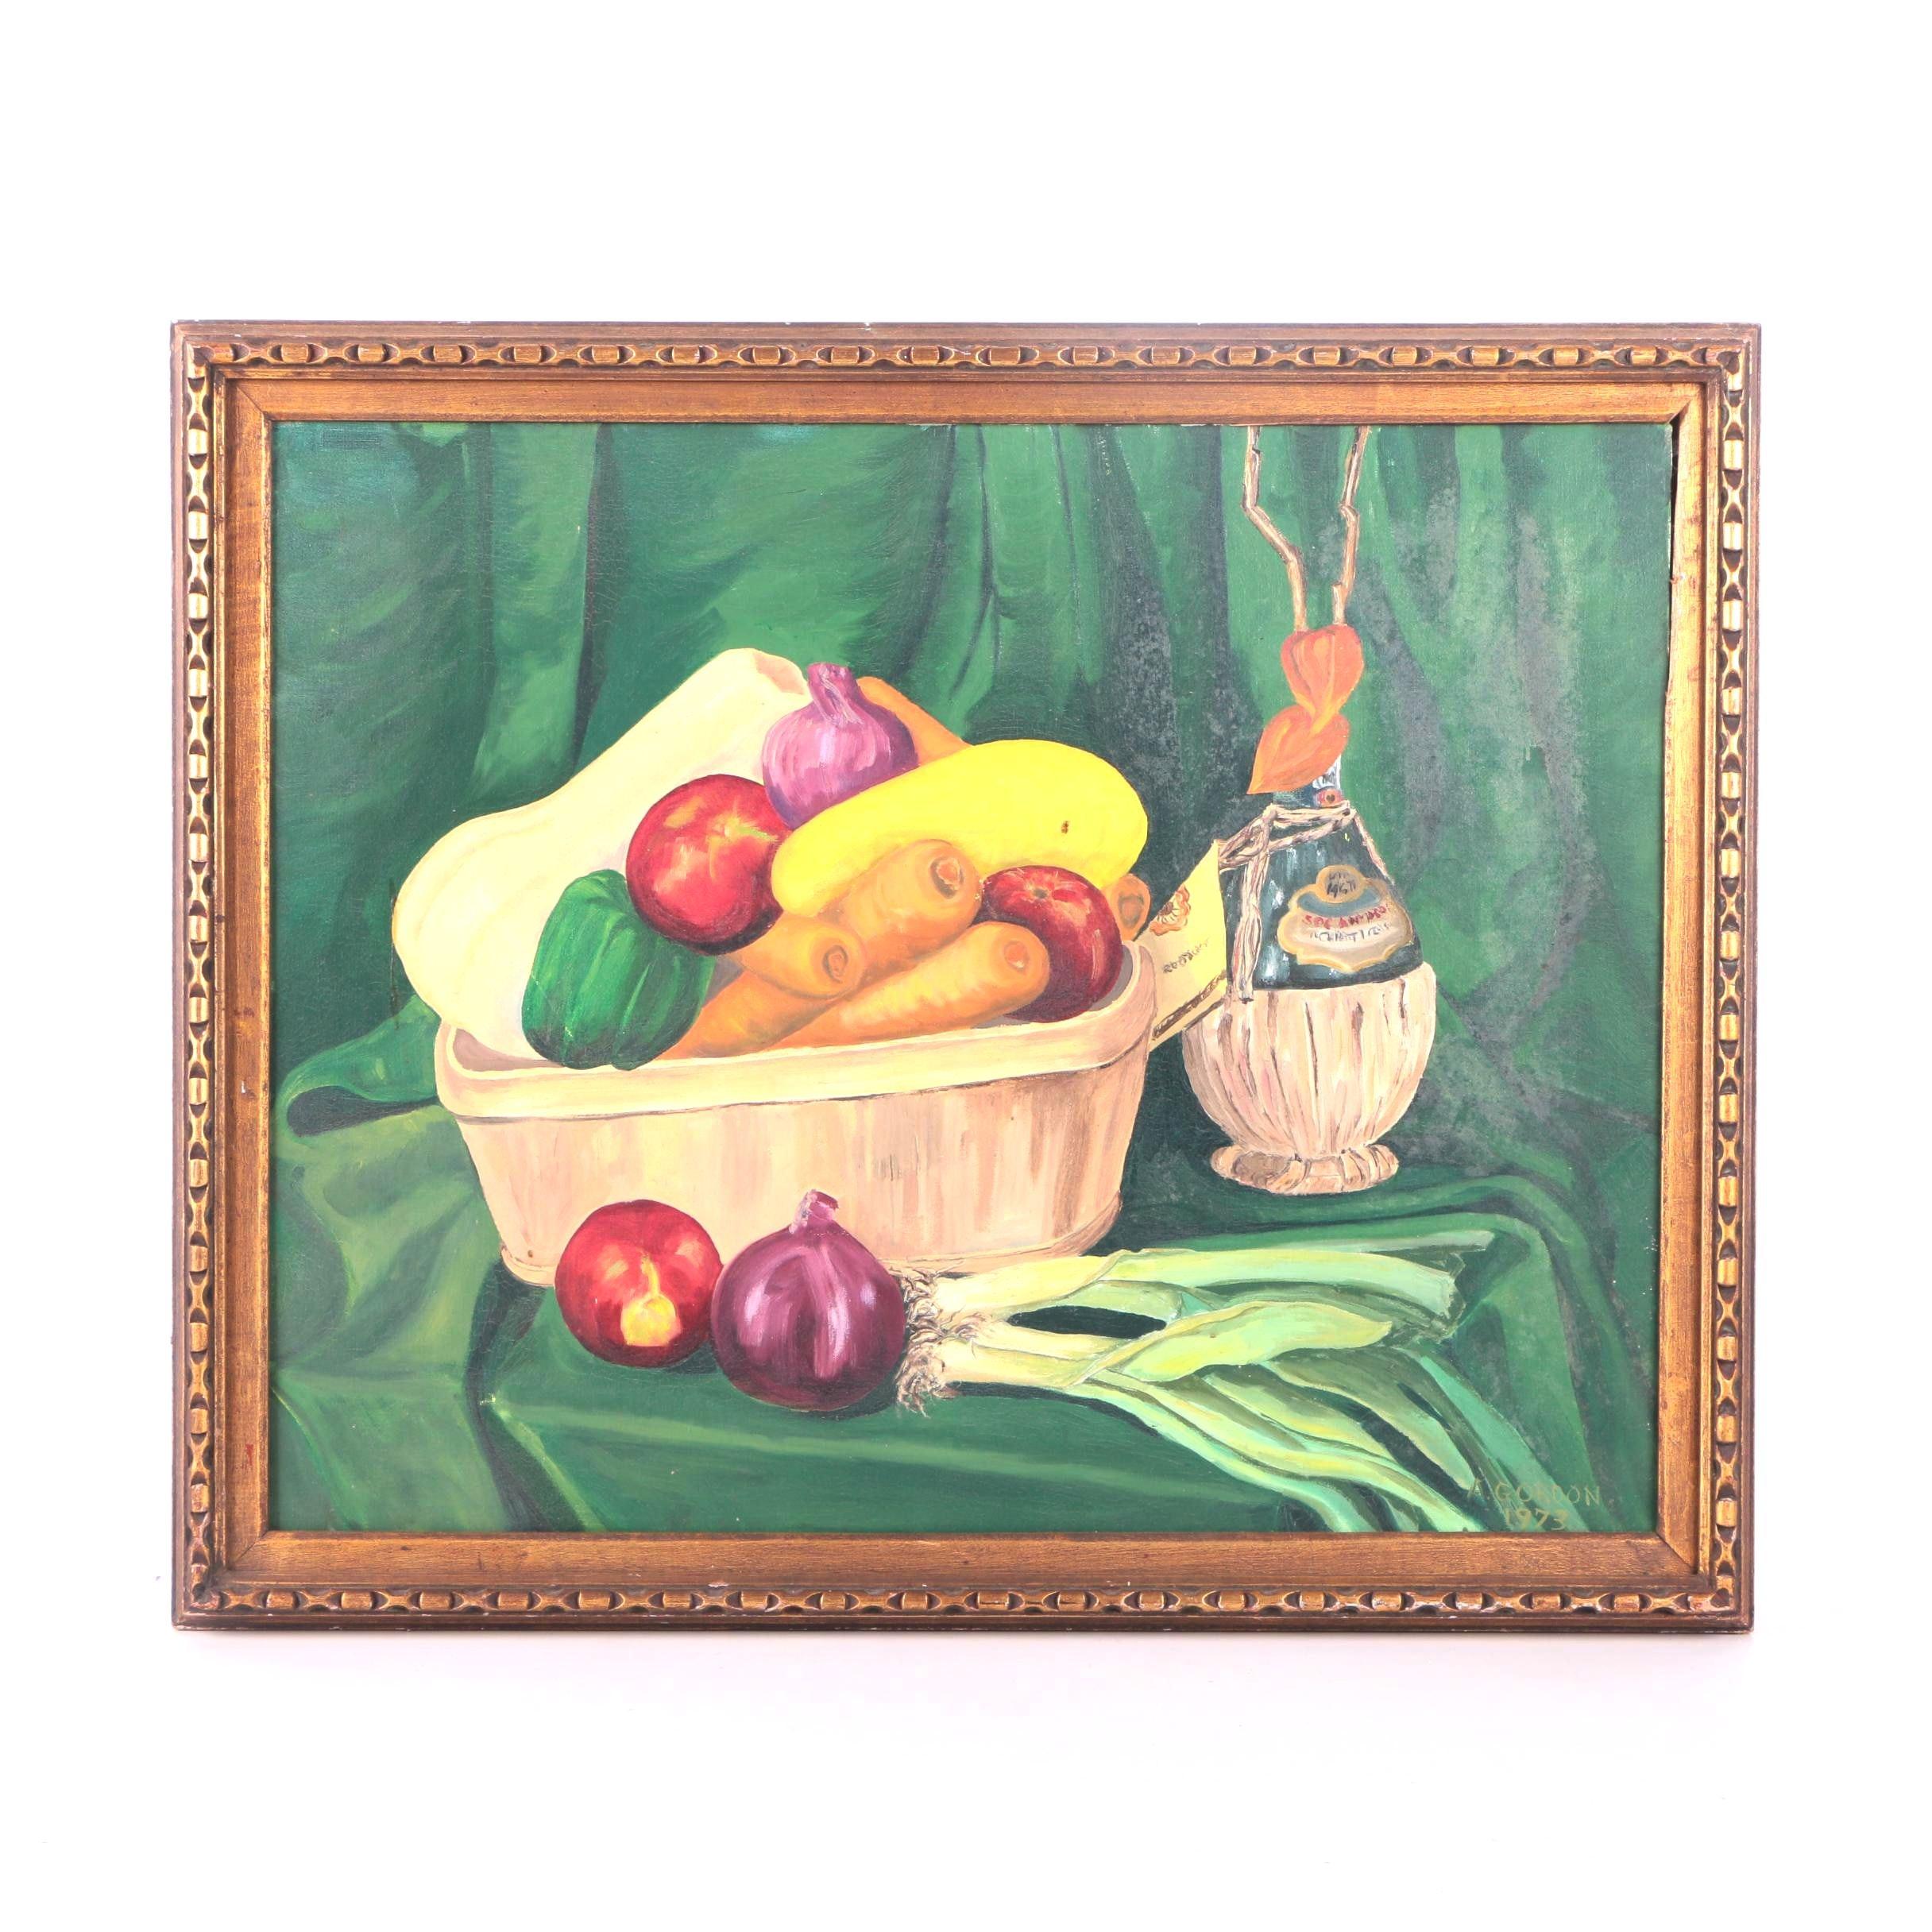 A. Gordon Acrylic Still Life Painting of Vegetables